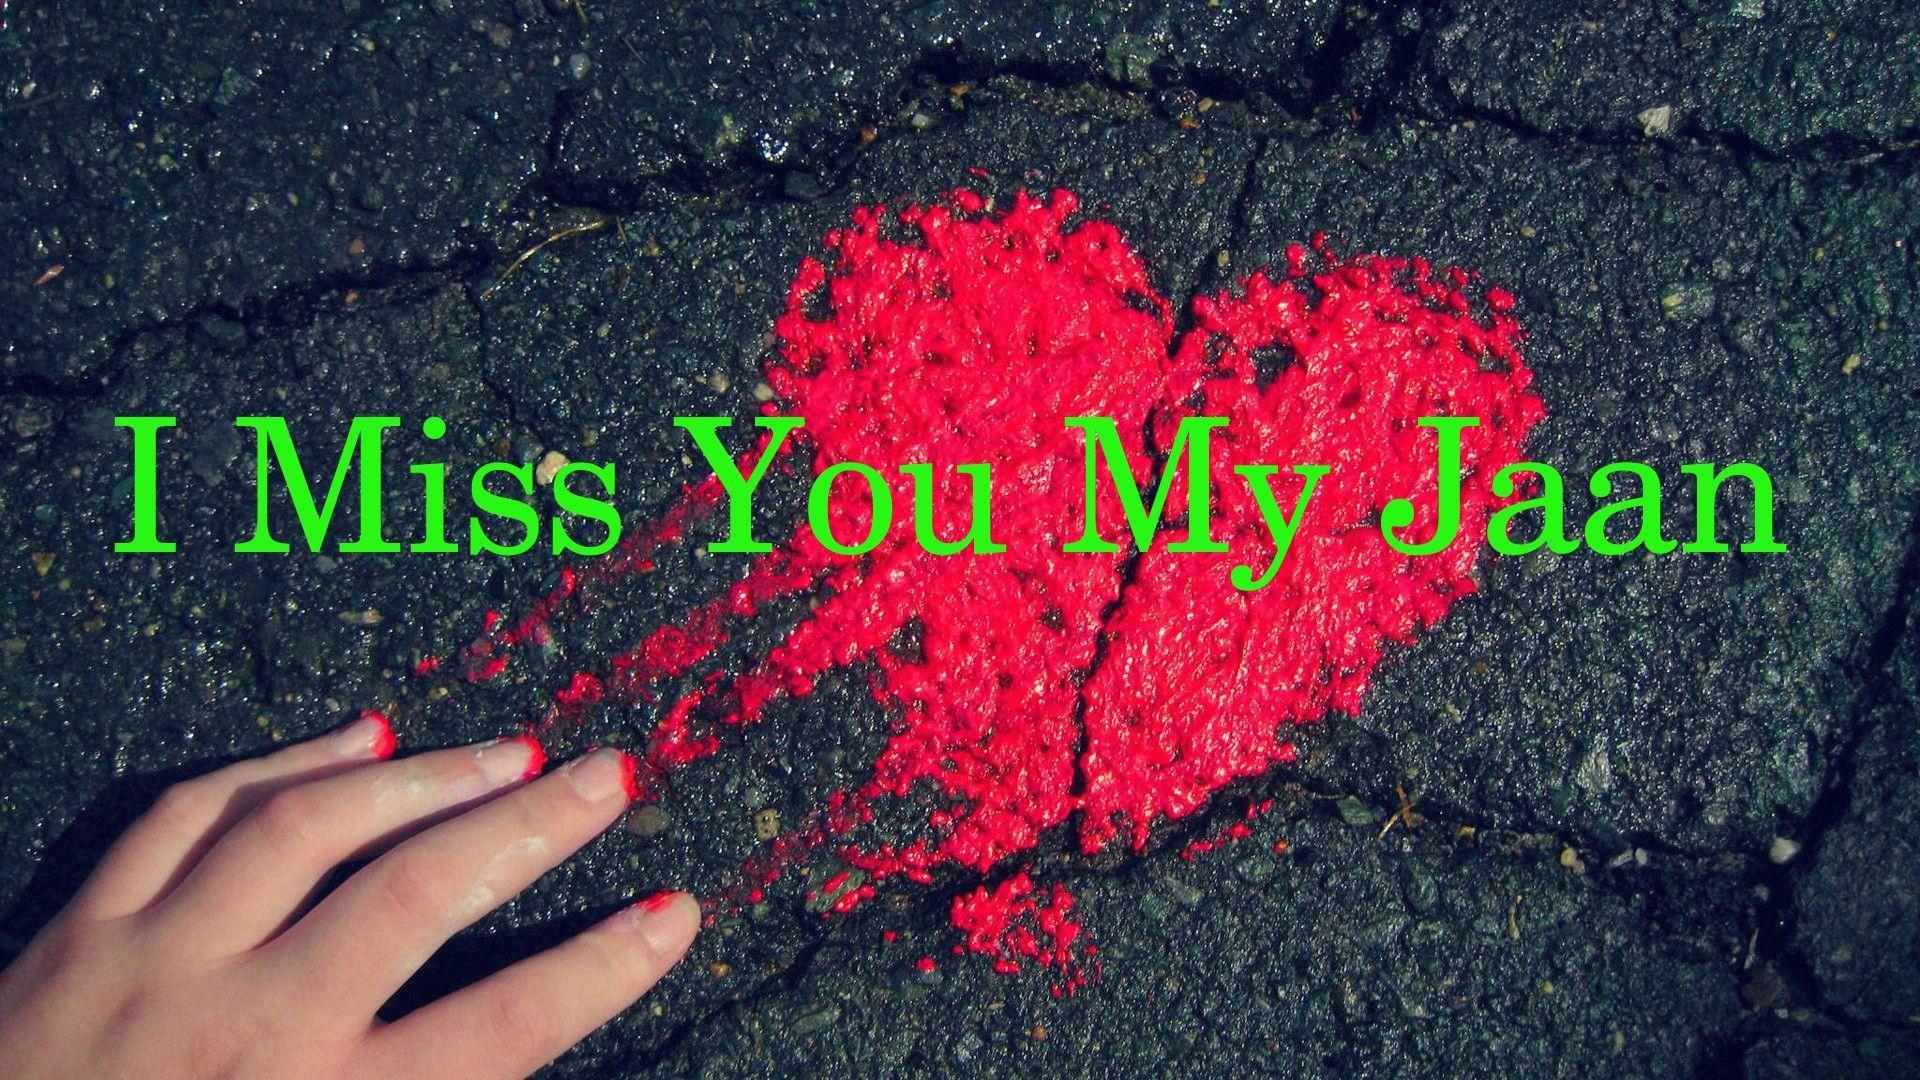 Punjabi Romantic Quotes Wallpaper Pics Of I Miss You Jaan Simplexpict1st Org